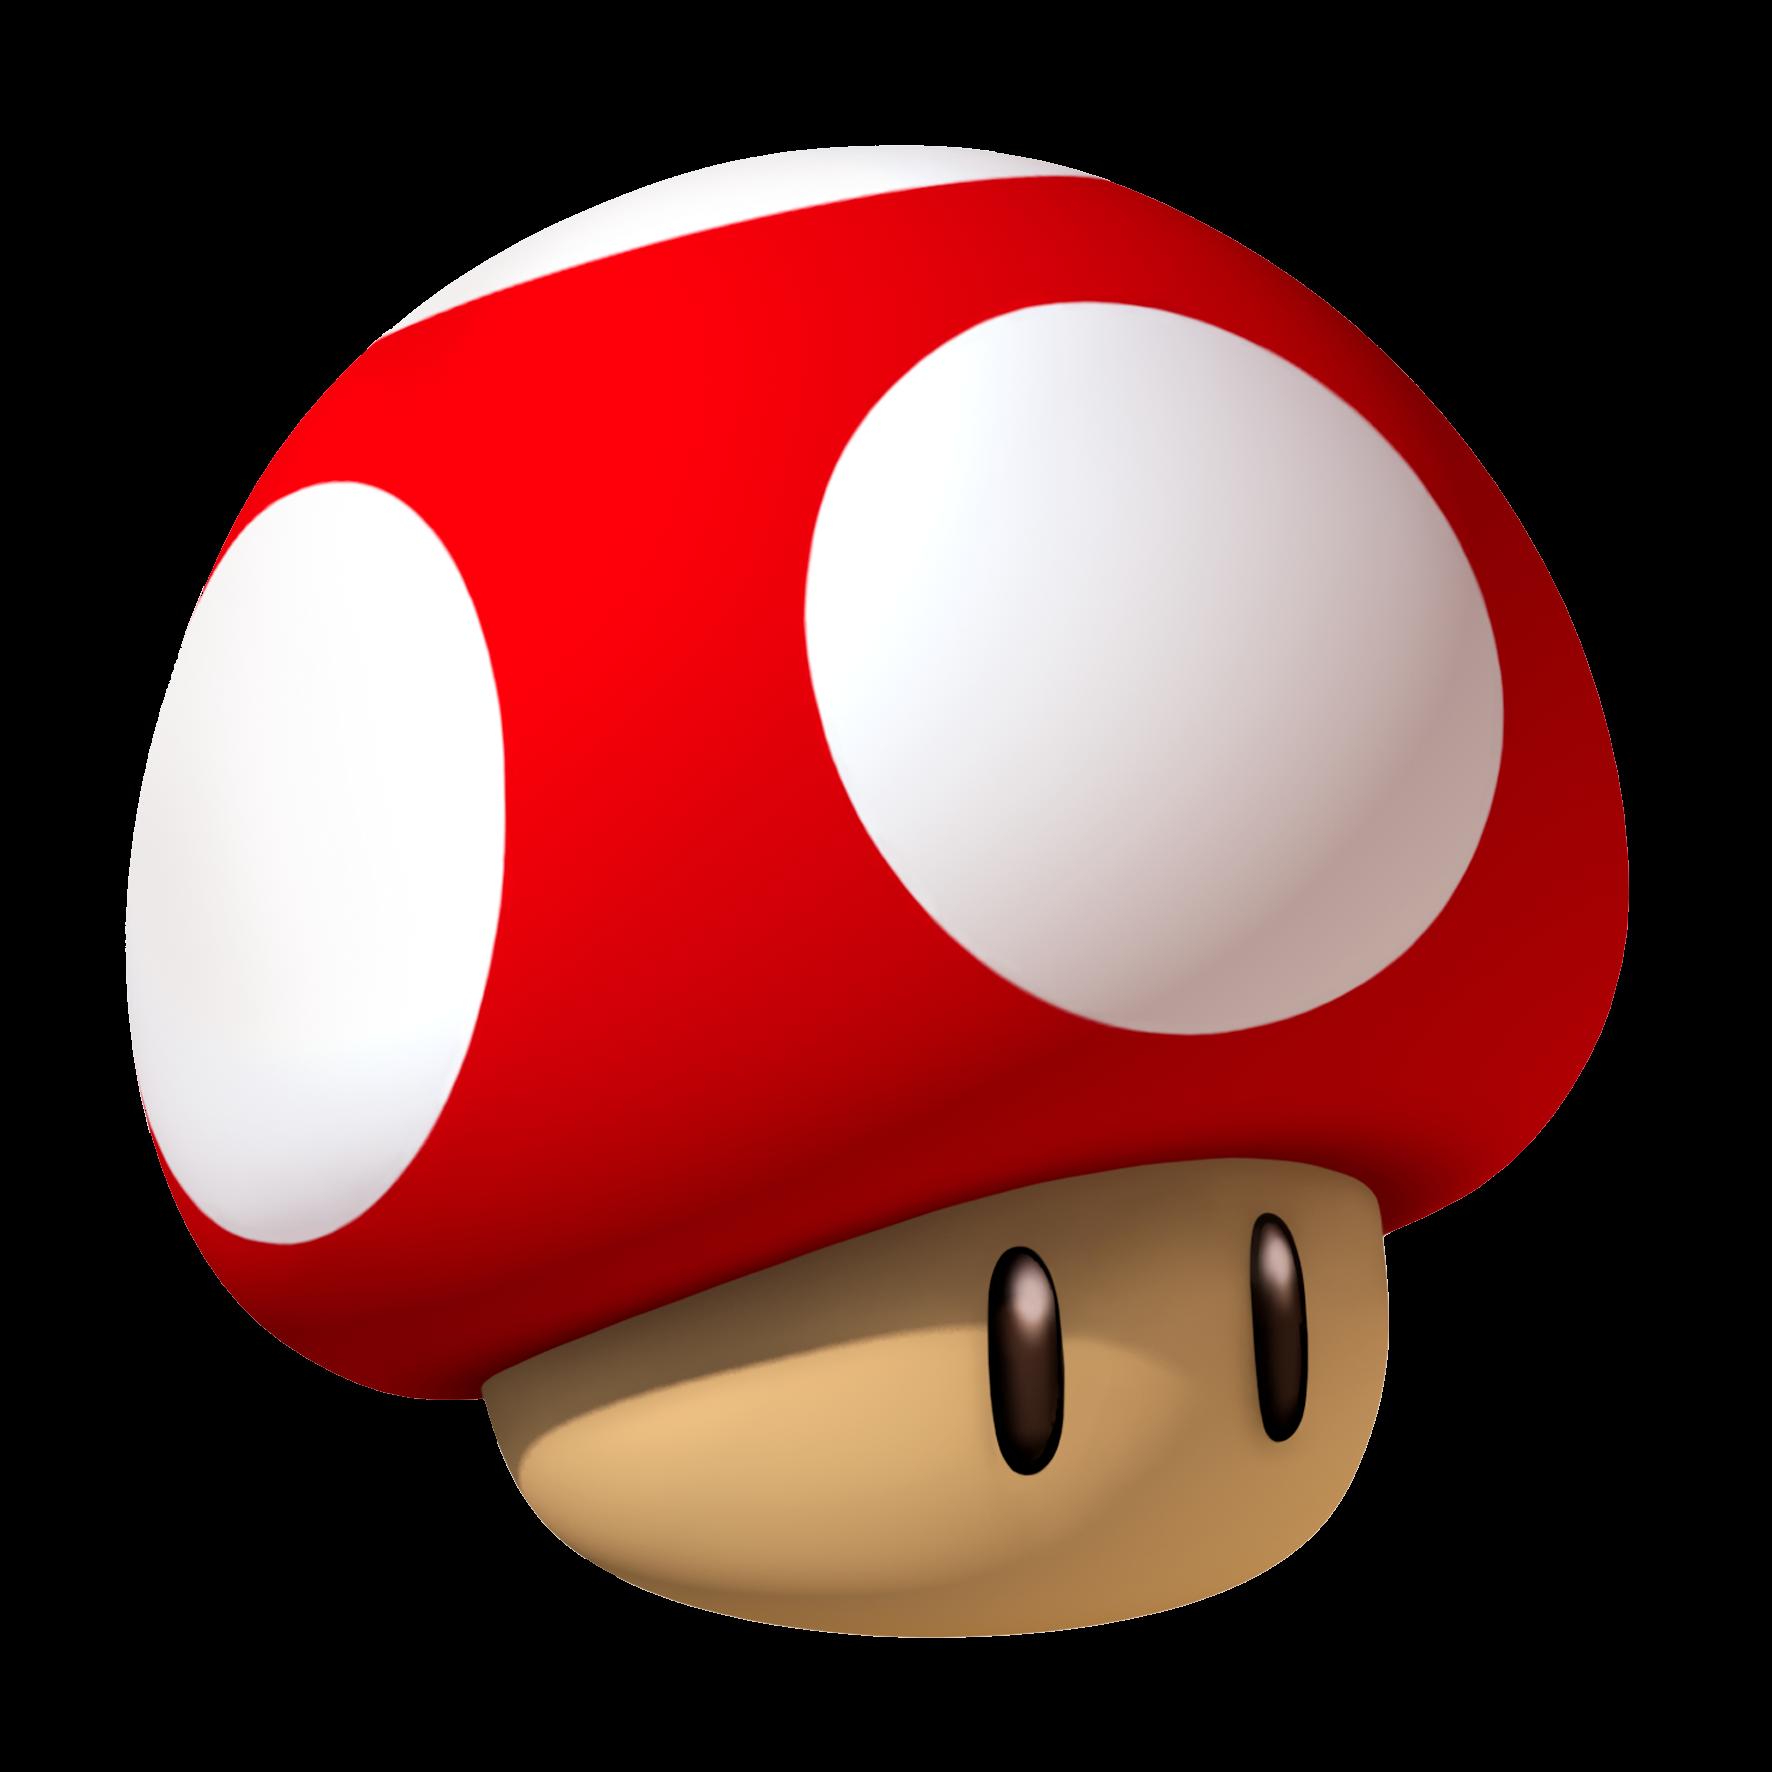 Image super mushroom sm. Mushrooms clipart mellow